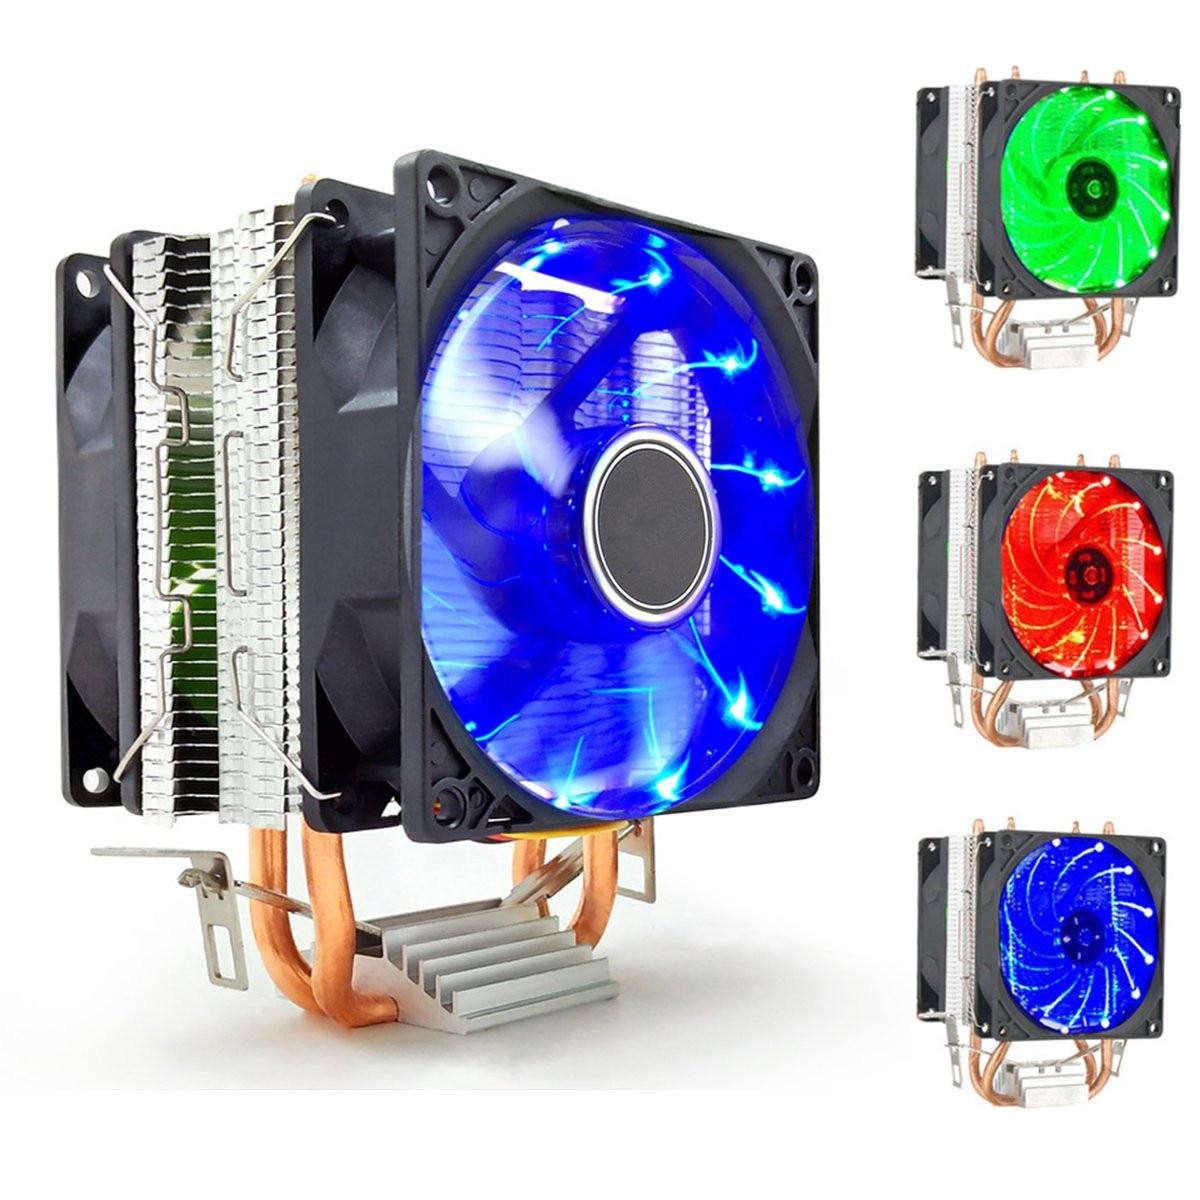 2 Heat Pipe CPU Cooler LED CPU Dual Fan Heatsink Radiator For LGA 1155 775 1156 AMD 12V Dual CPU Cooler Powerful Fan For AMD